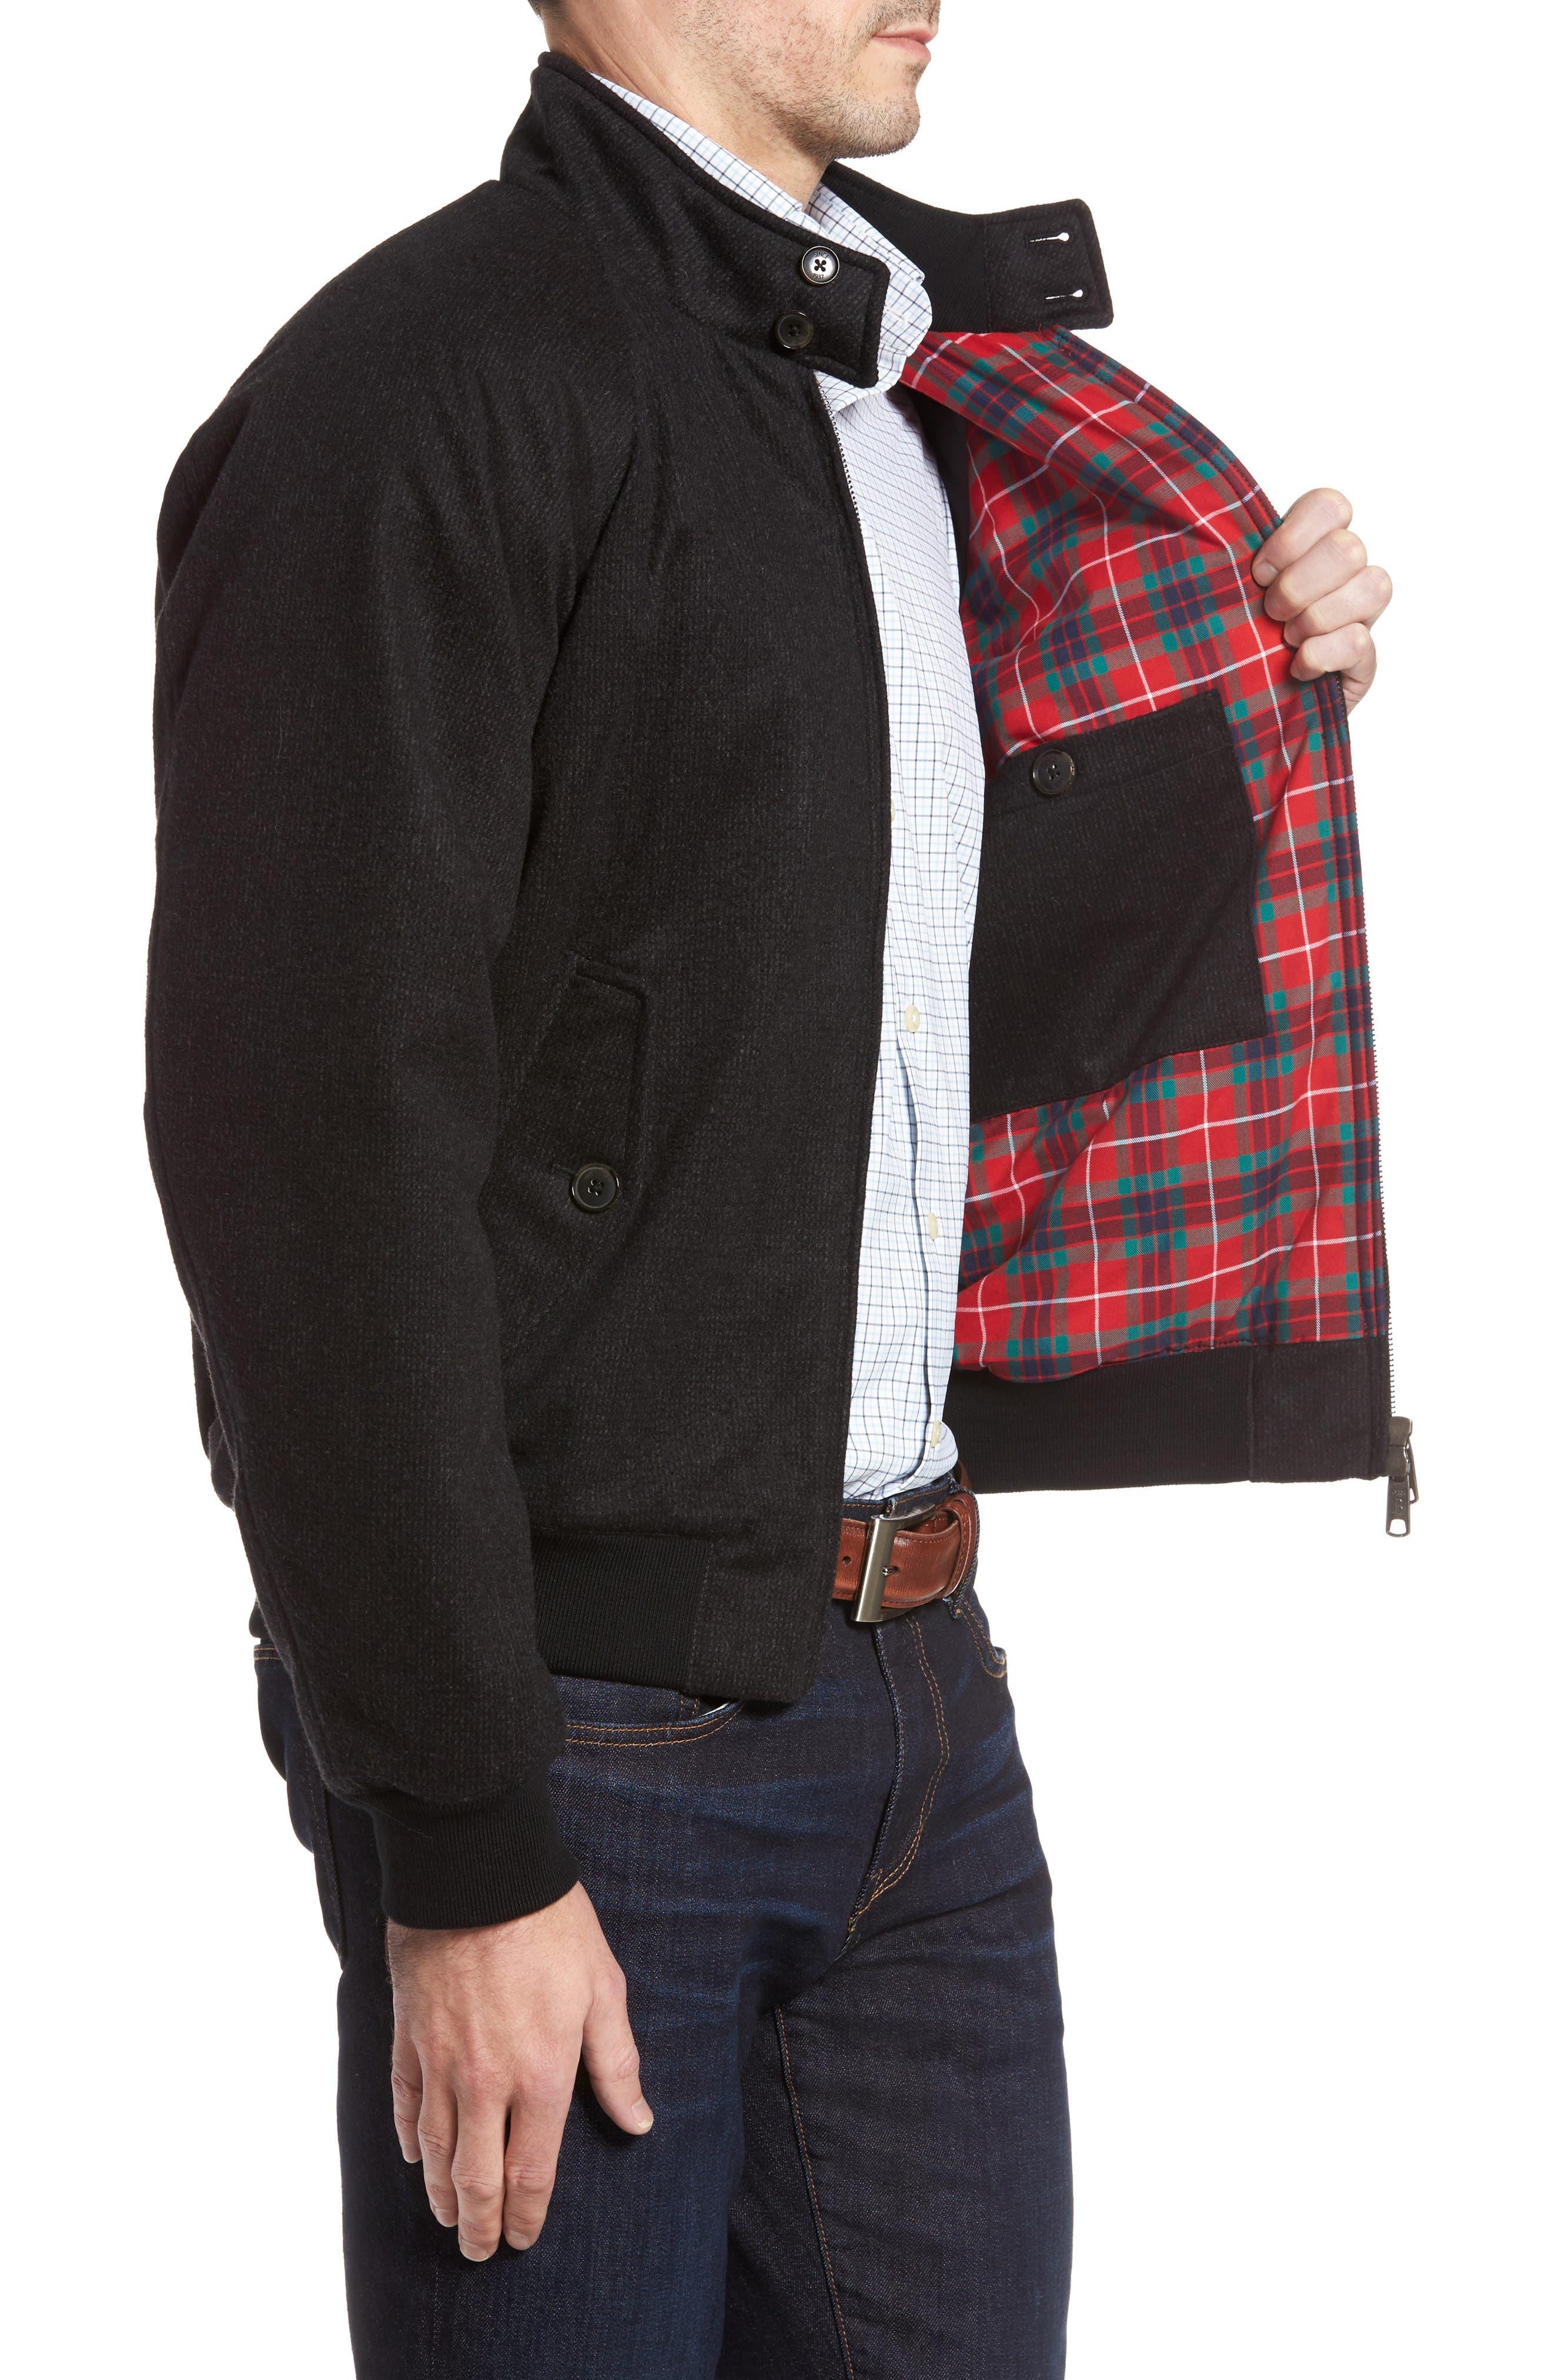 G9 Waterproof Wool Blend Harrington Jacket,                             Alternate thumbnail 3, color,                             020